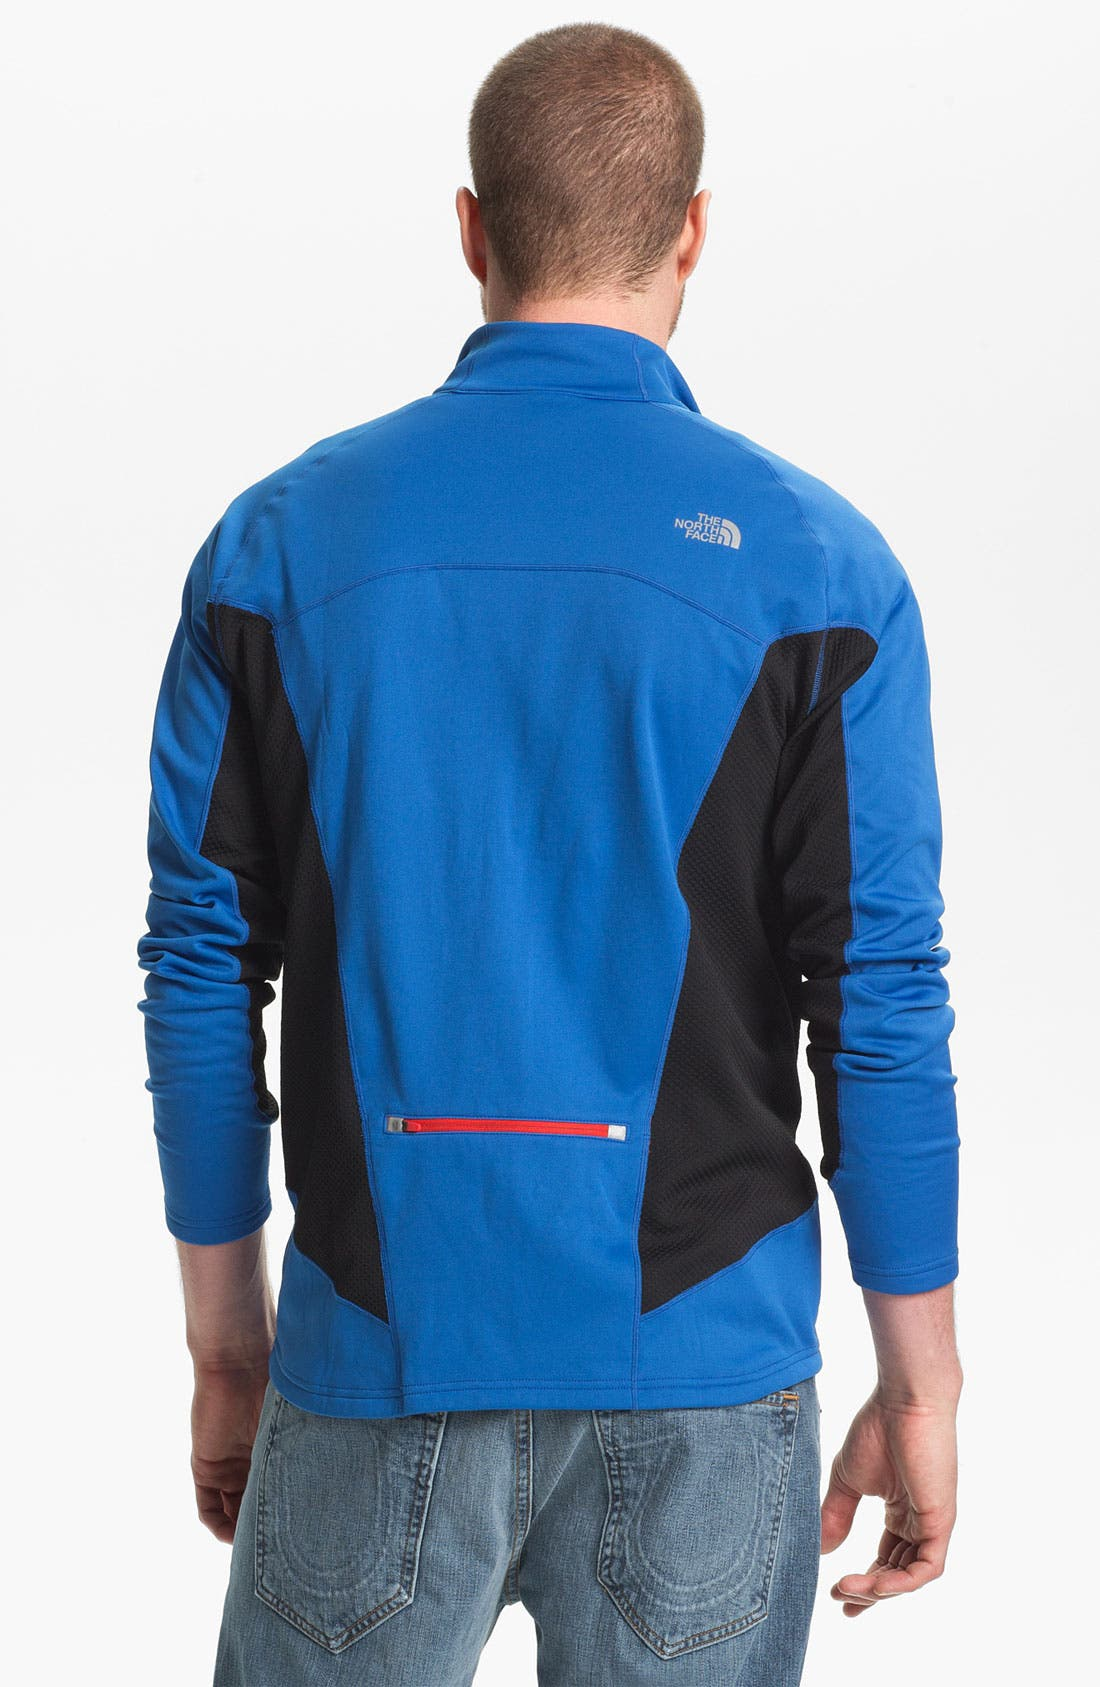 Alternate Image 2  - The North Face 'Teocalli' Hybrid Fleece Jacket